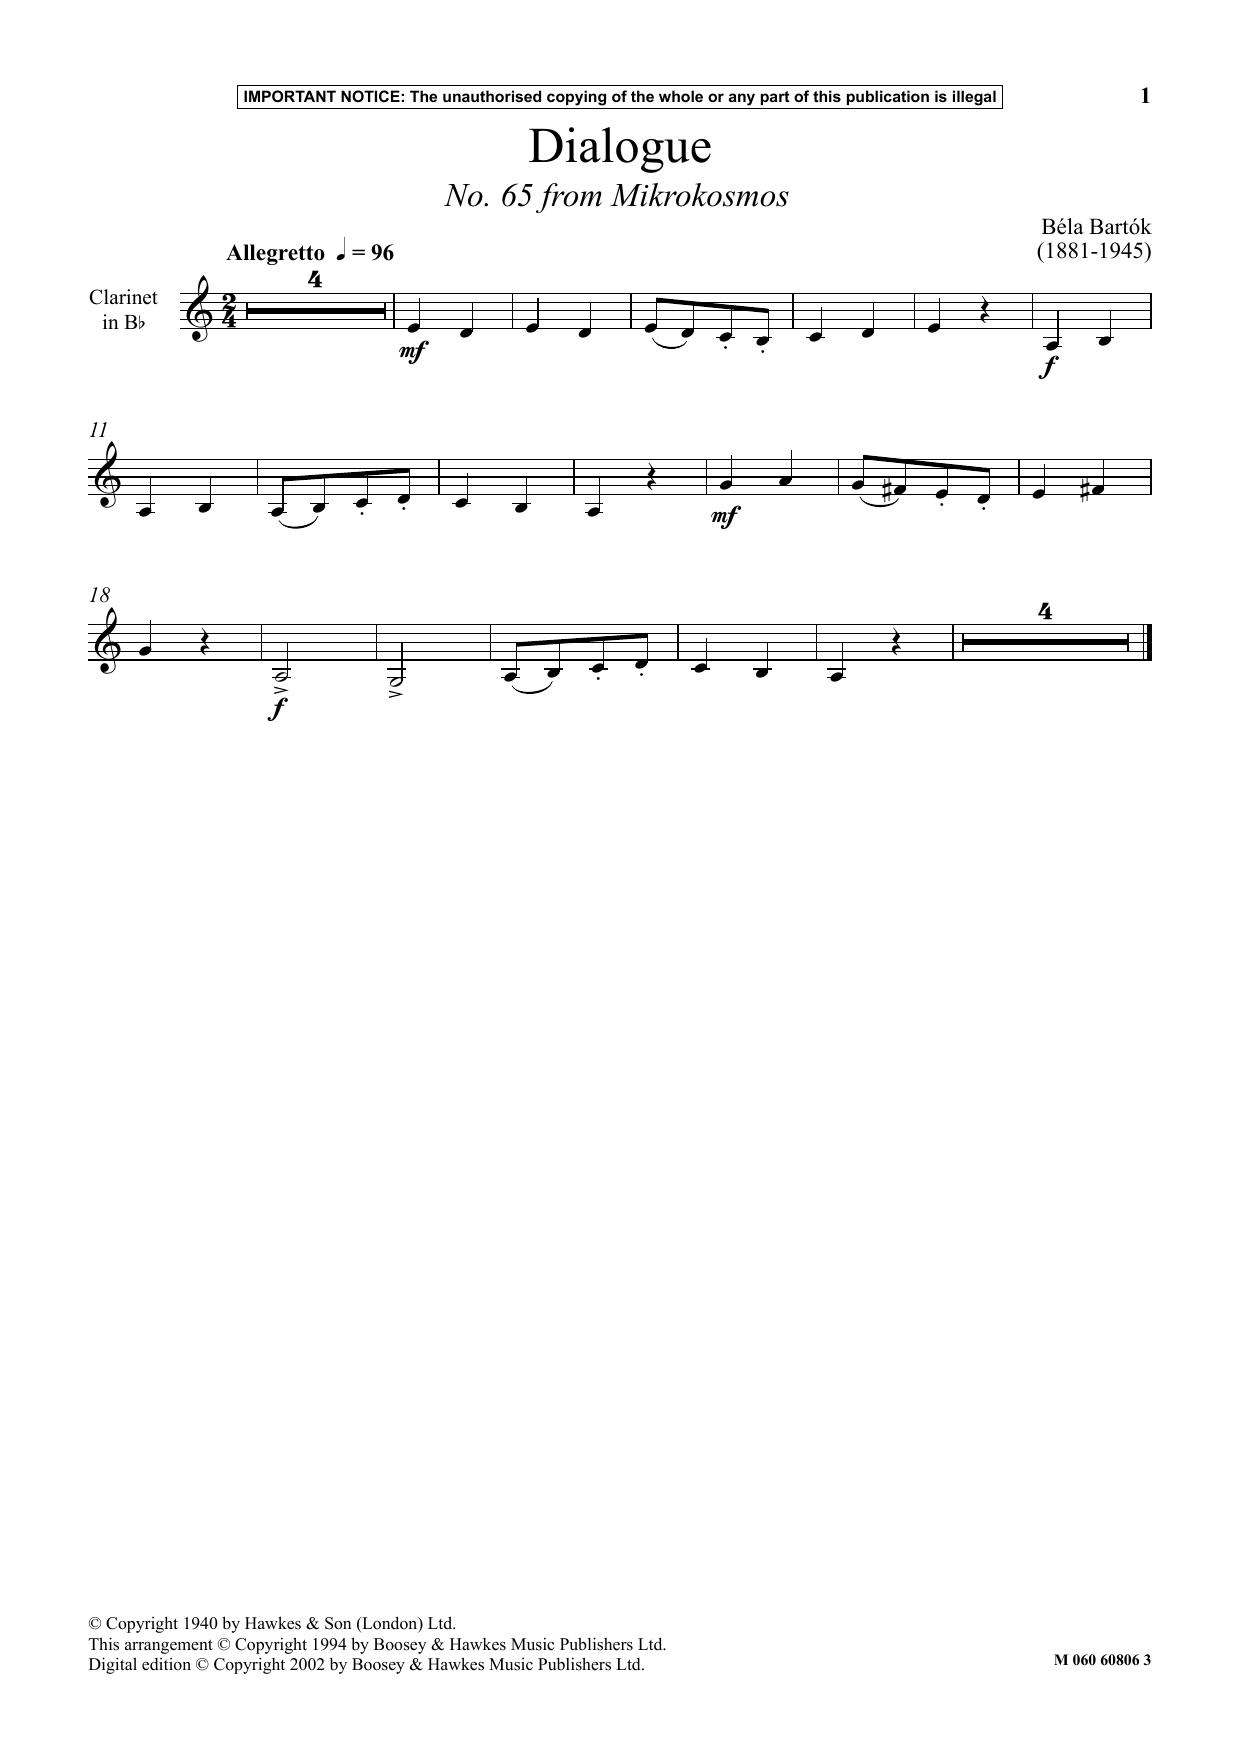 Dialogue (No. 65 from Mikrokosmos) (Instrumental Solo)